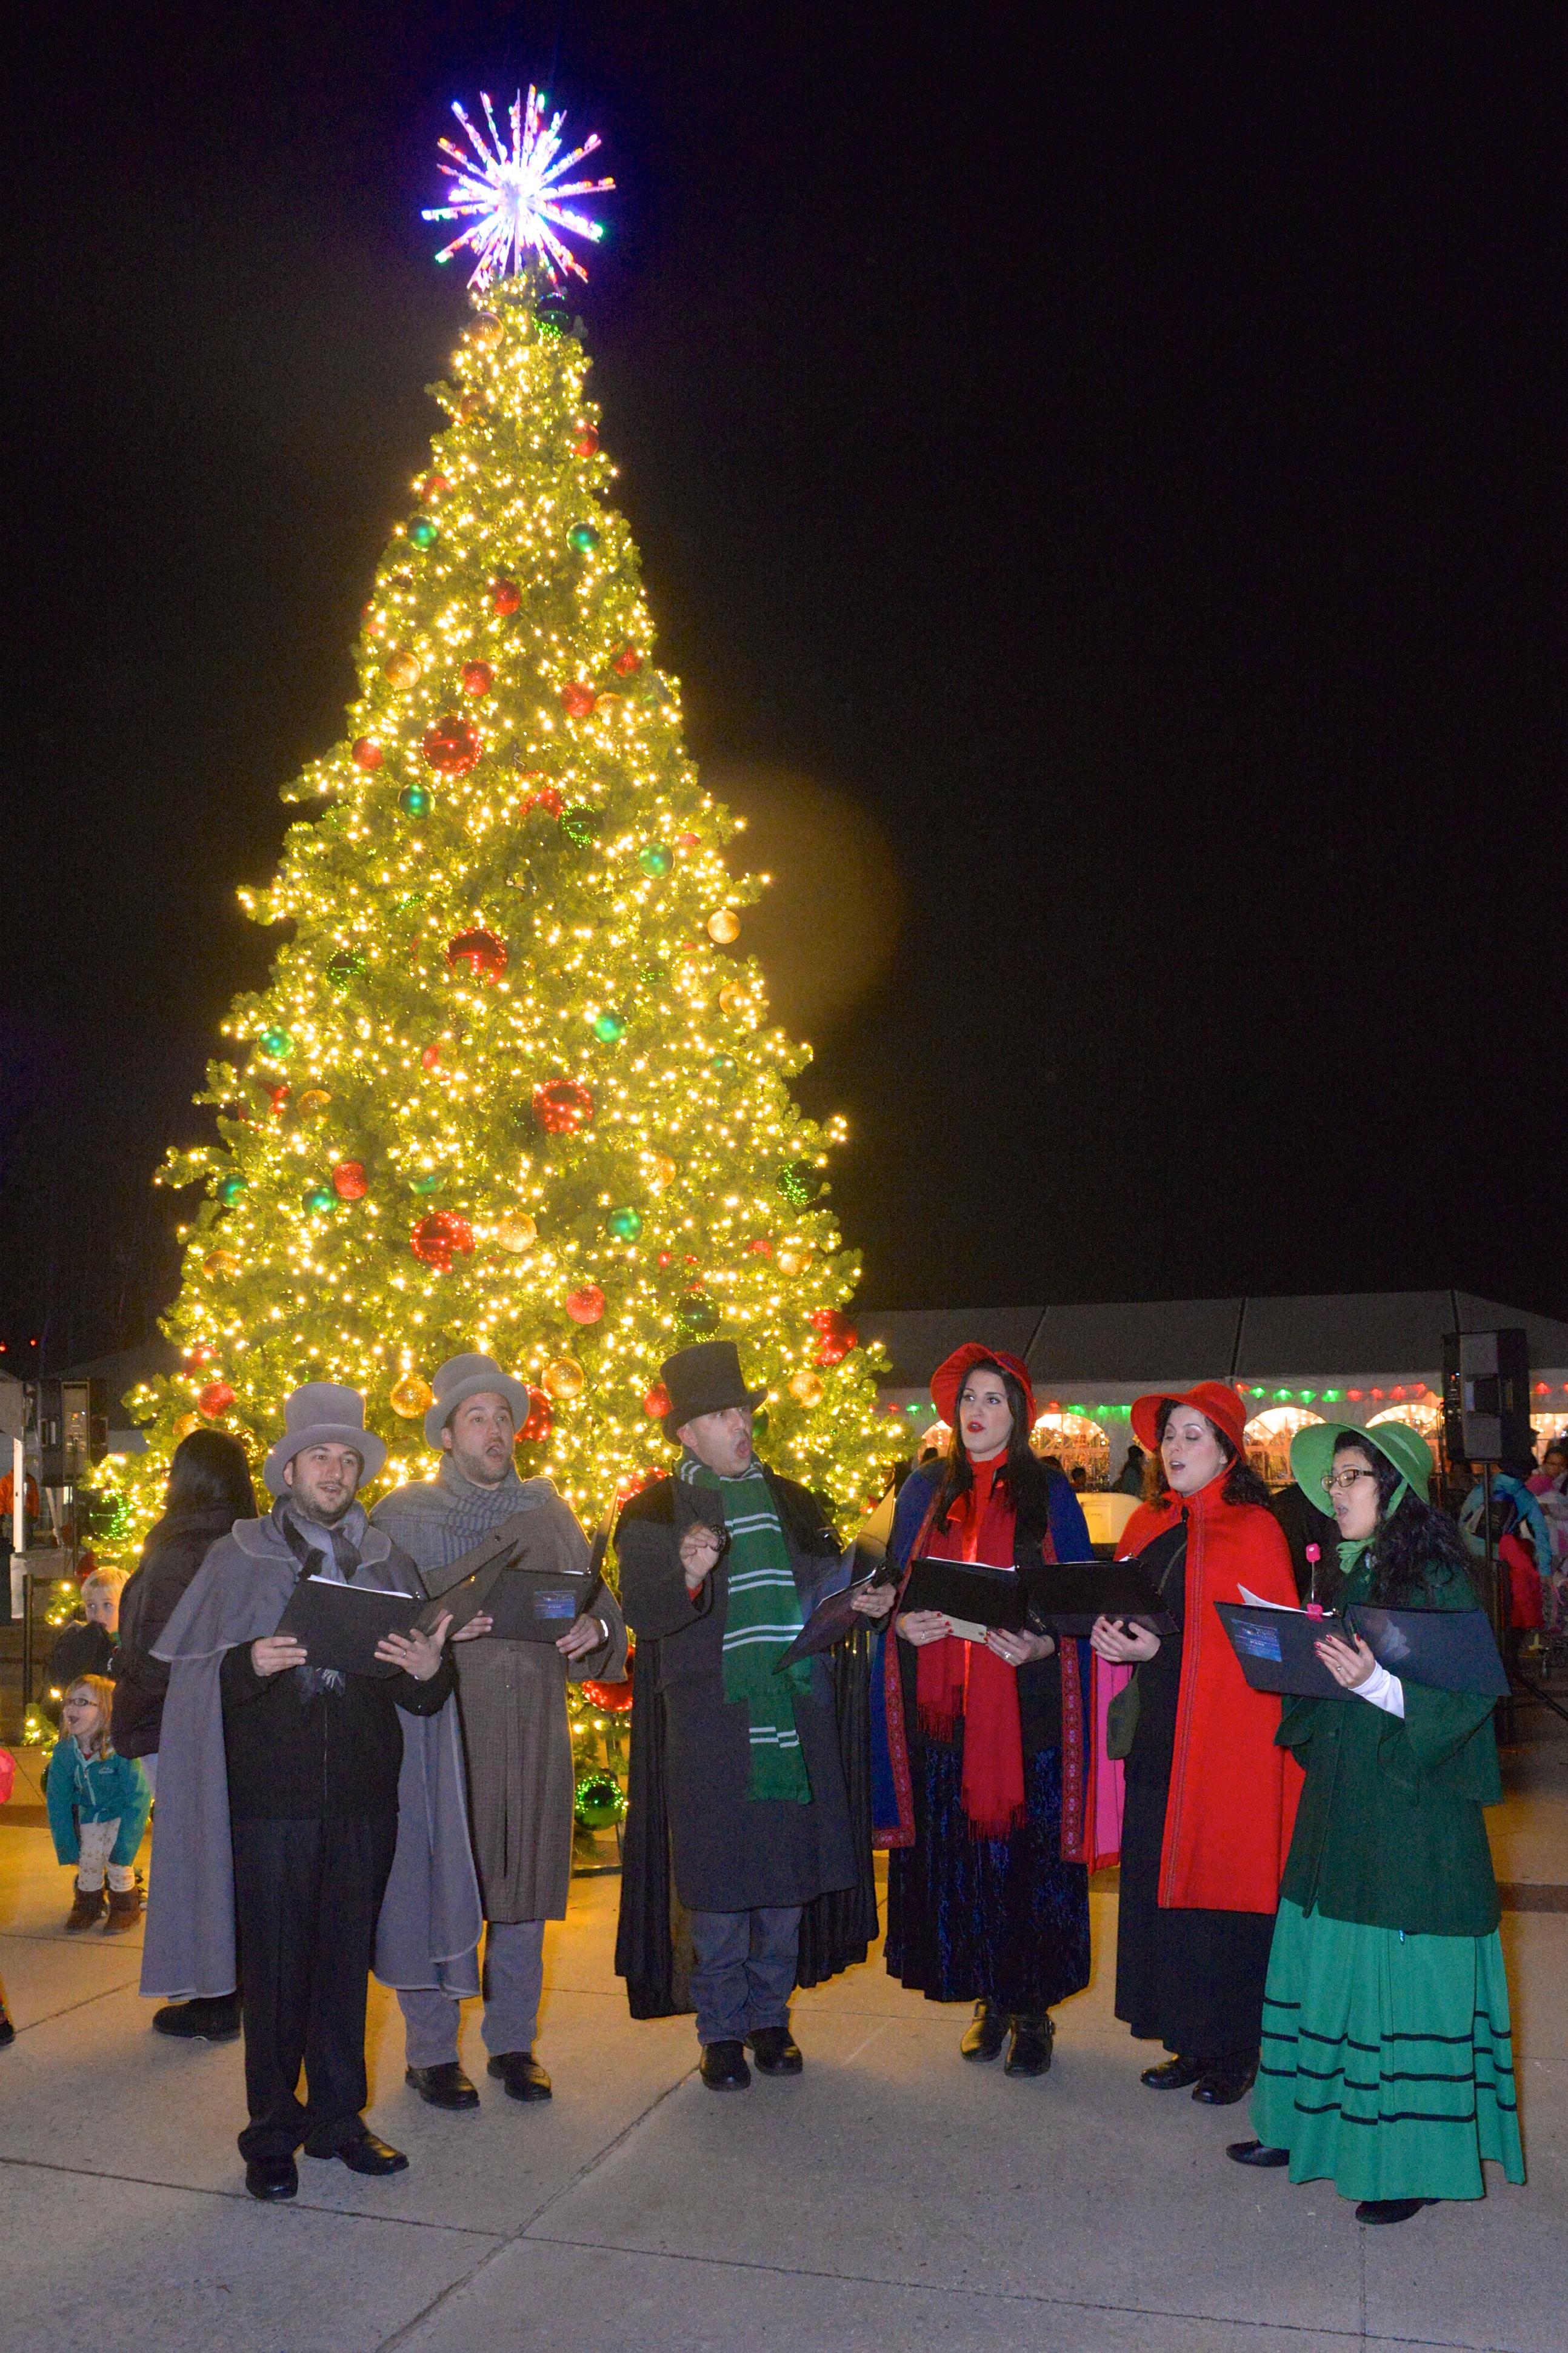 Westchester's Winter Wonderland Christmas trees